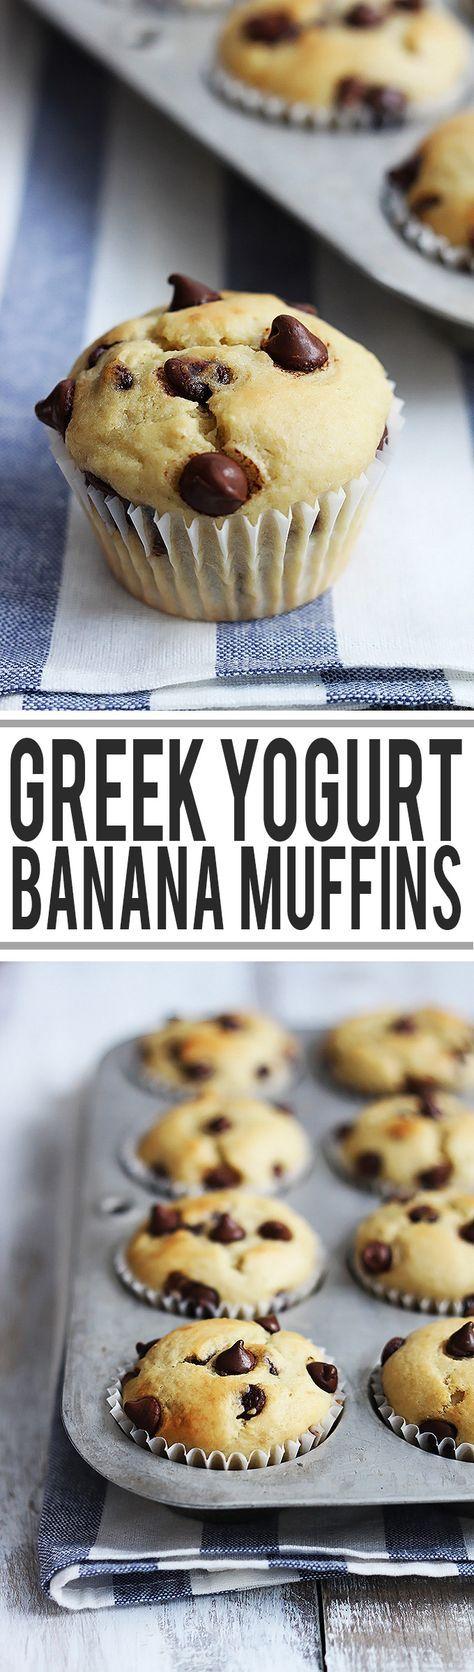 Easy and fluffy, super-moist banana greek yogurt muffins with a boost of breakfast-worthy protein!   Creme de la Crumb